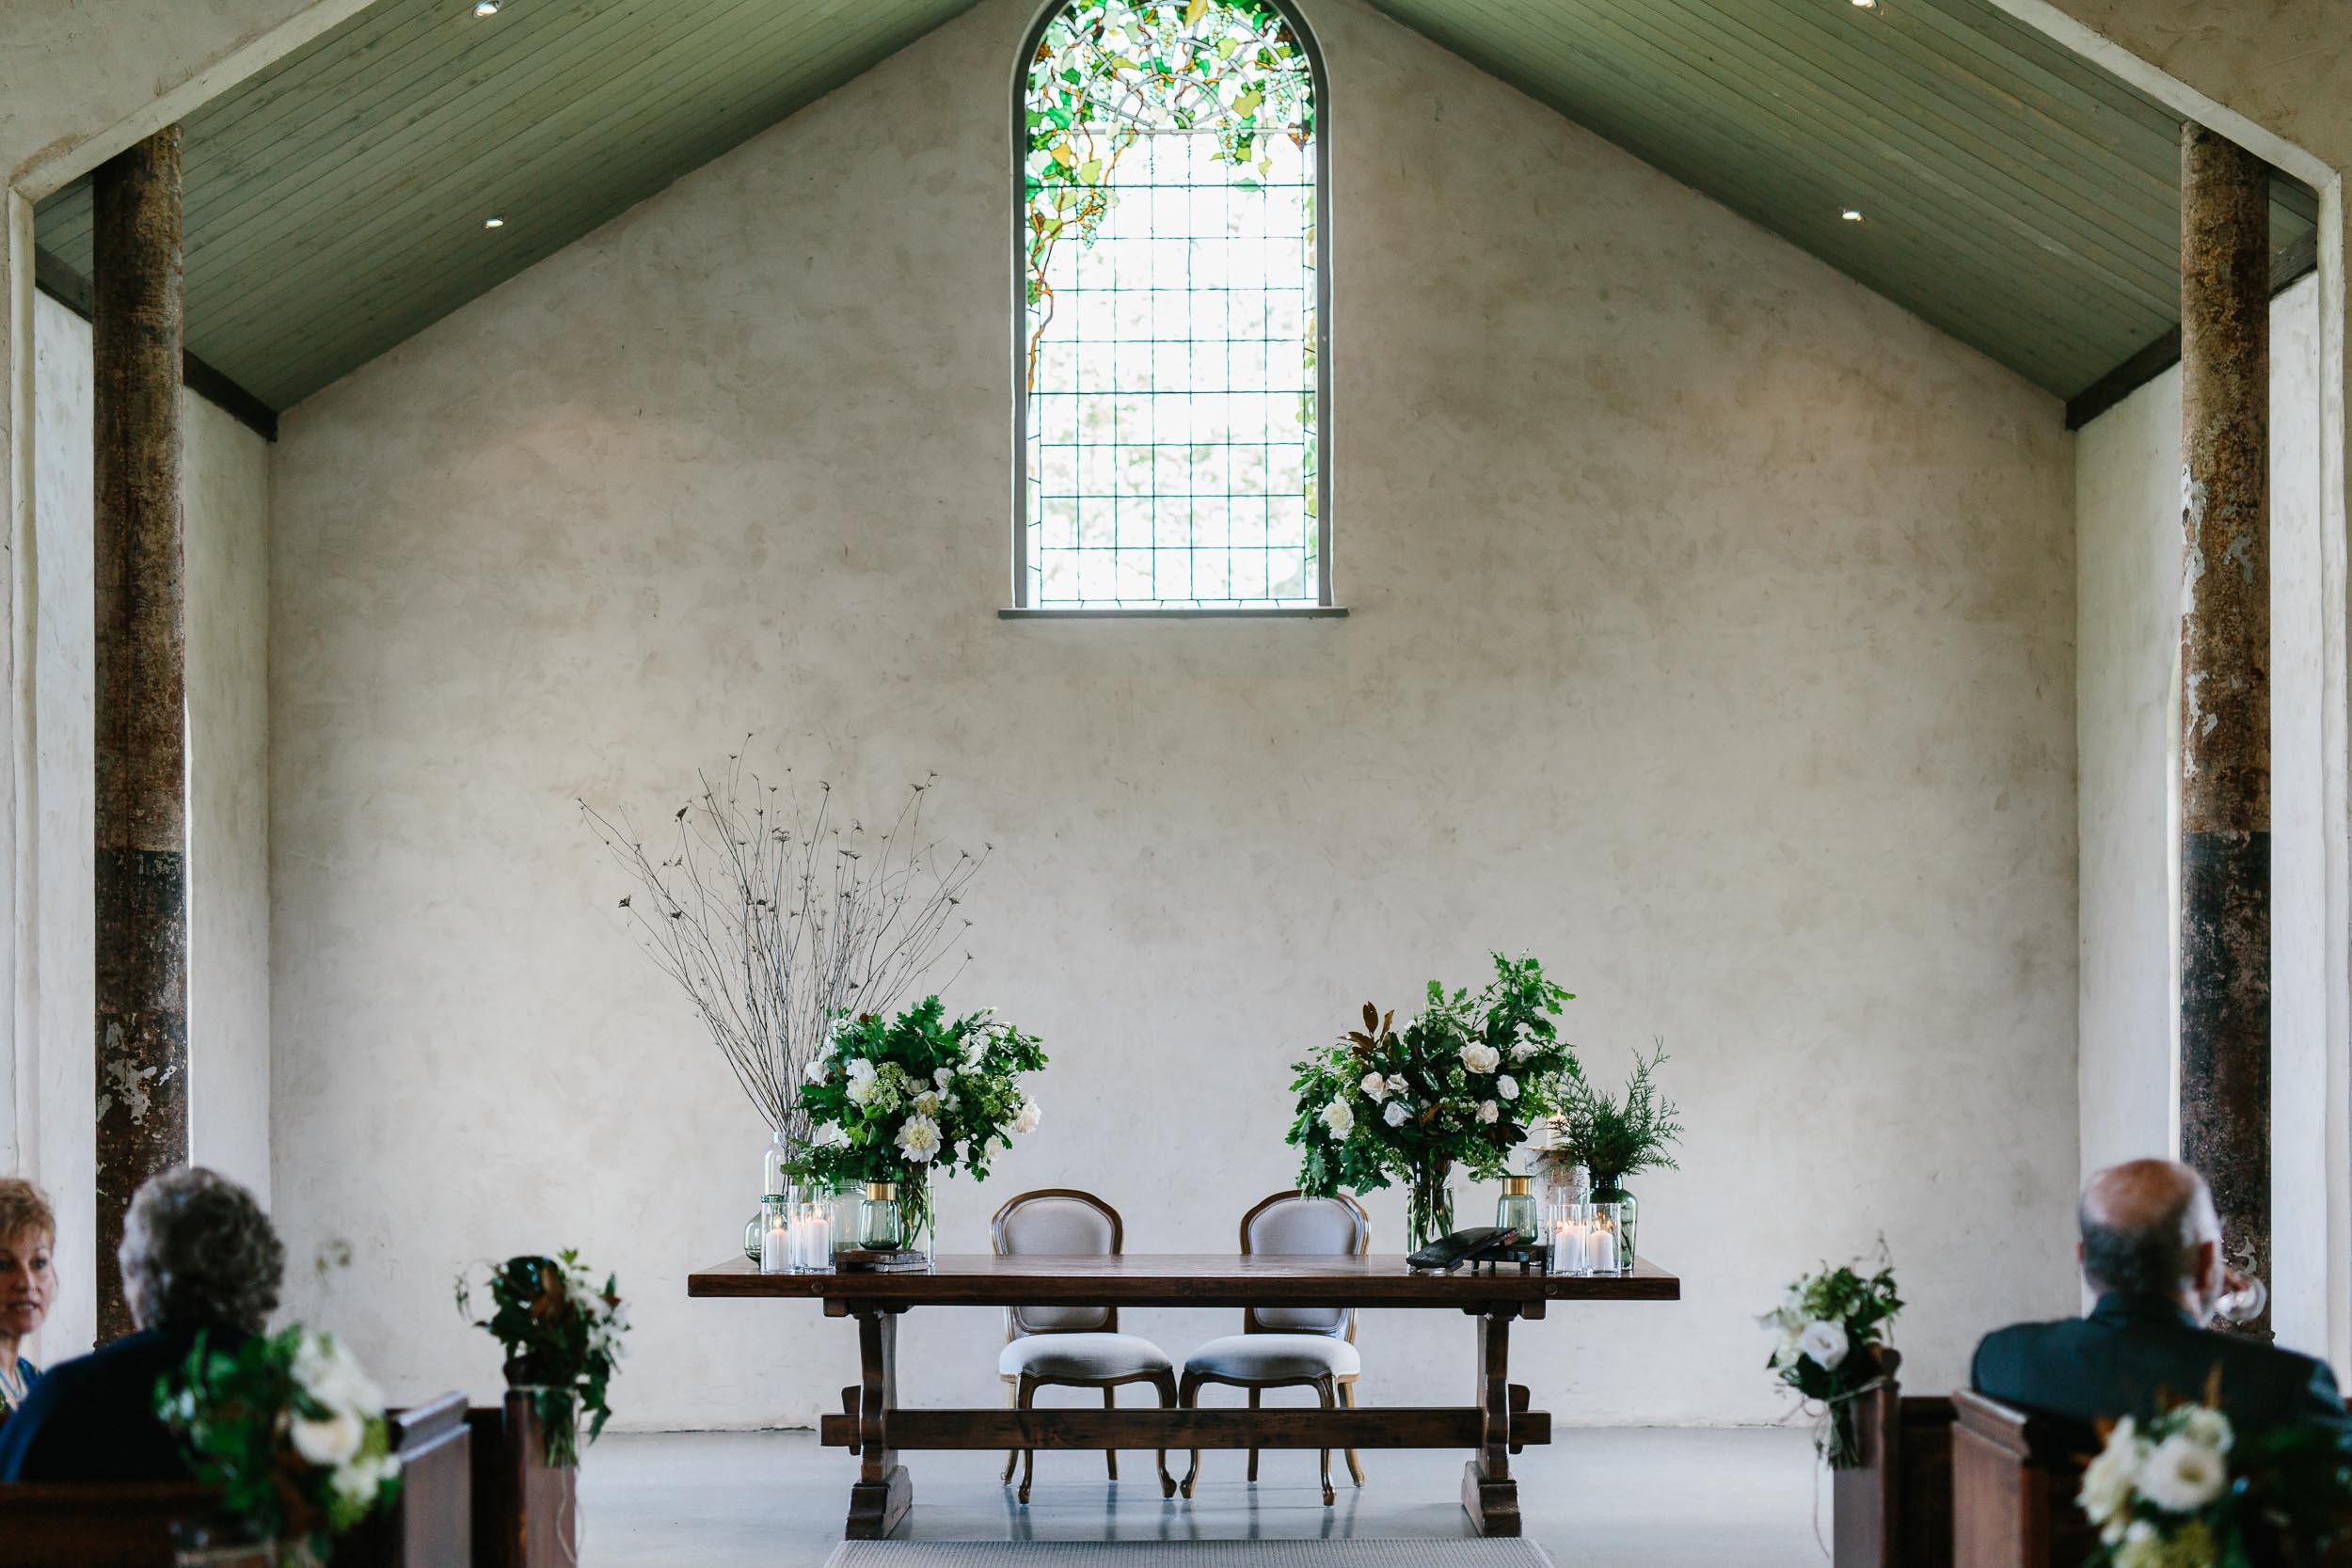 Kas-Richards-Stones-of-the-Yarra-Valley-Wedding-201.jpg